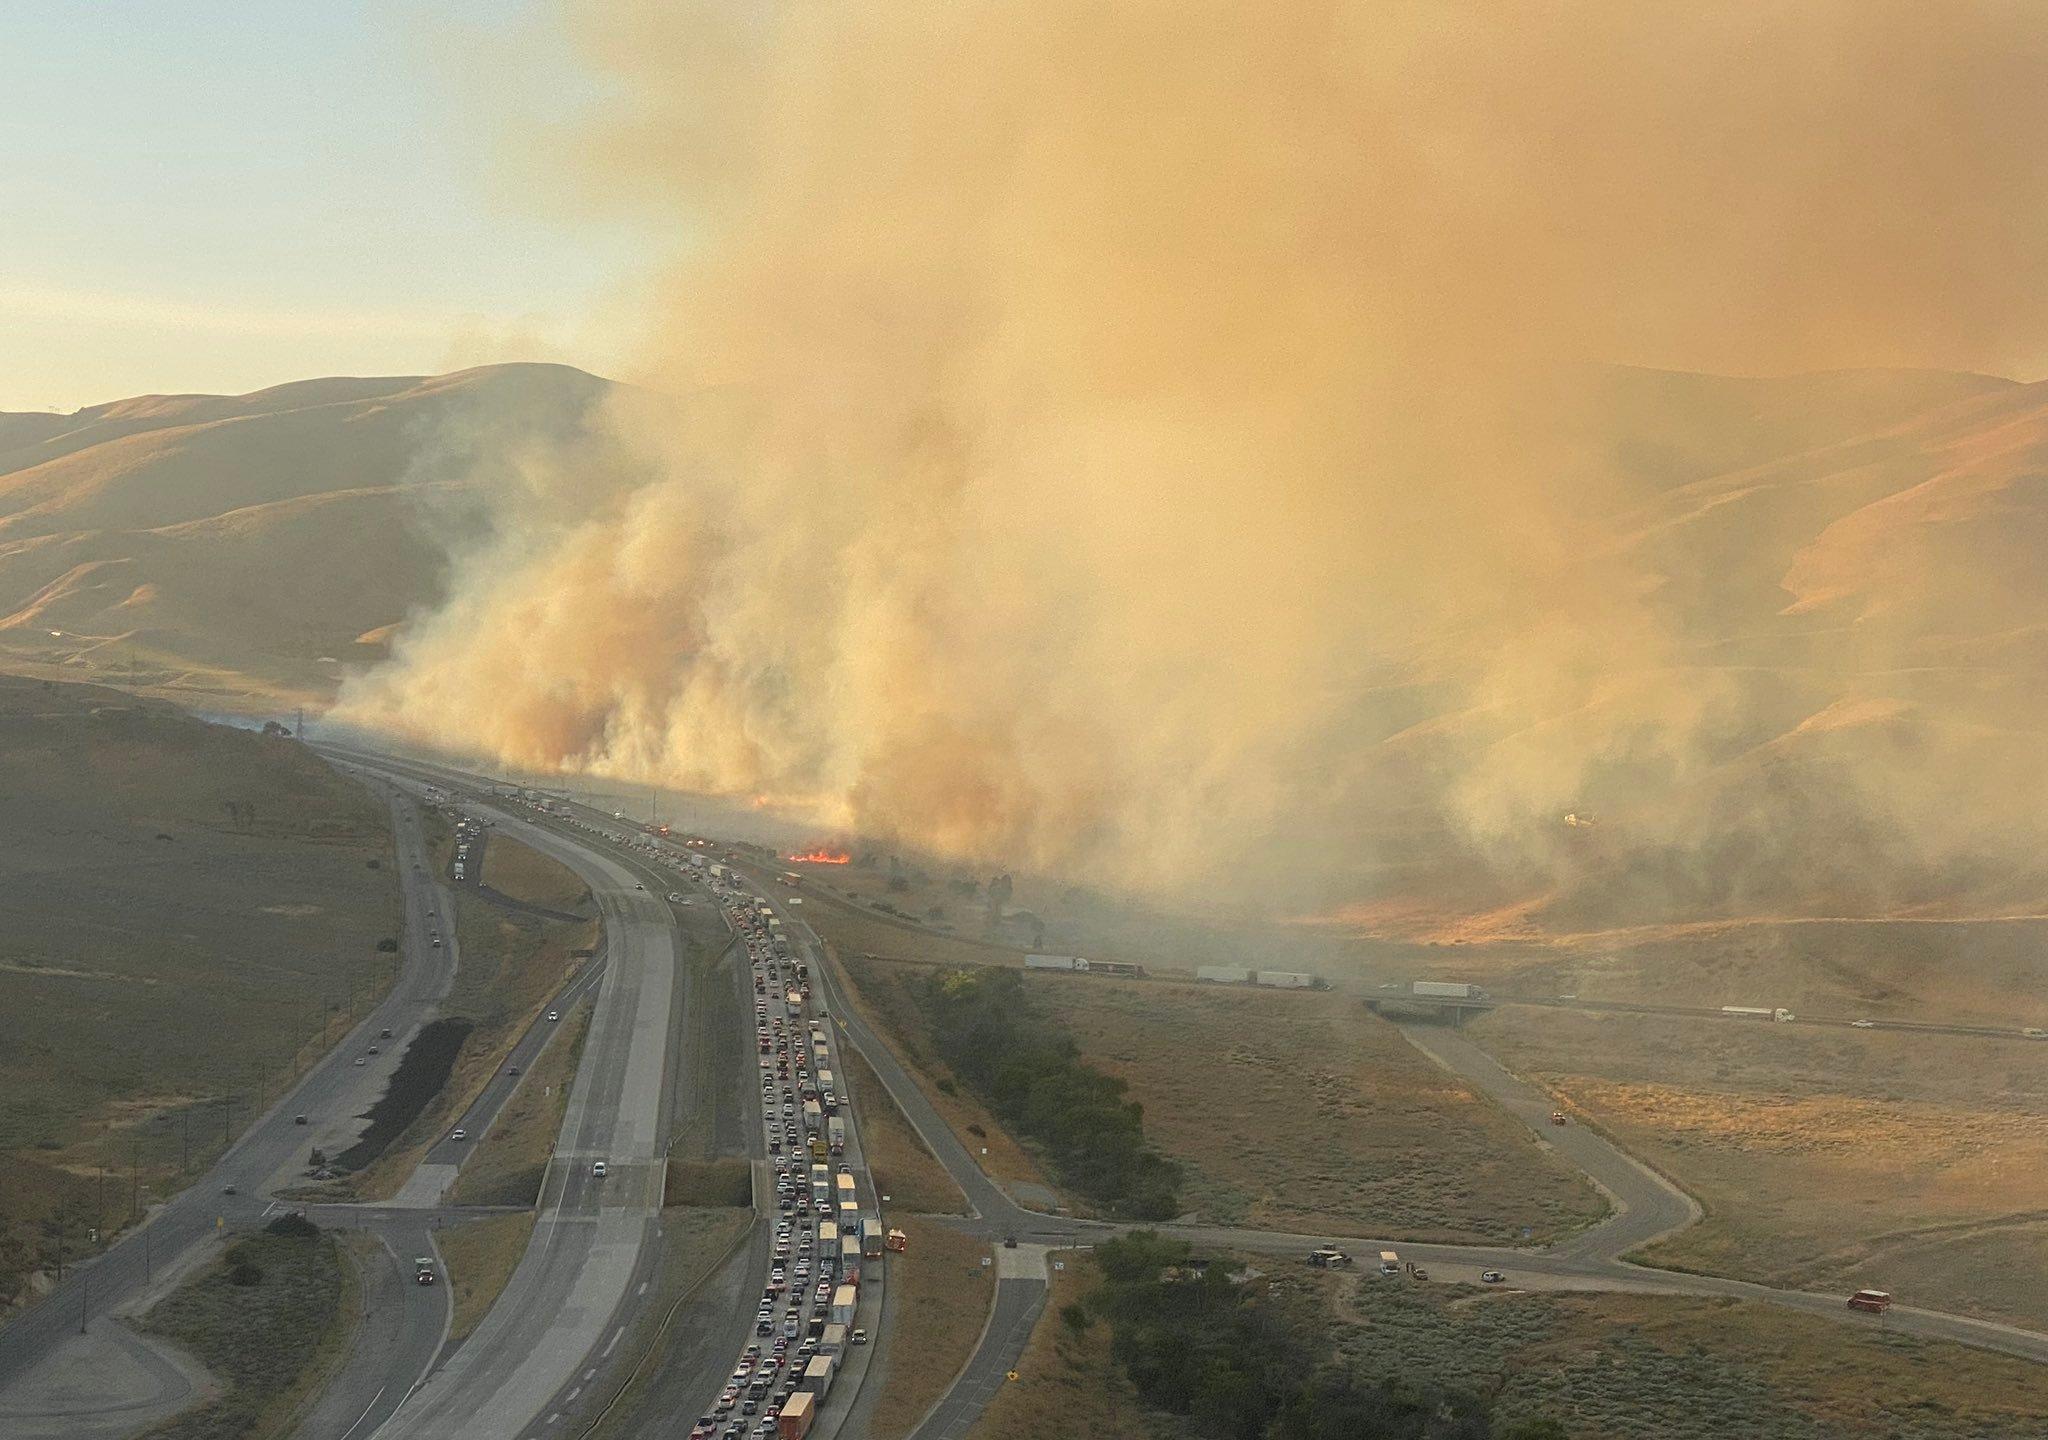 Post Fire Burns 200 Acres Near Gorman Causing 5 Freeway Closures And Delays Ktla